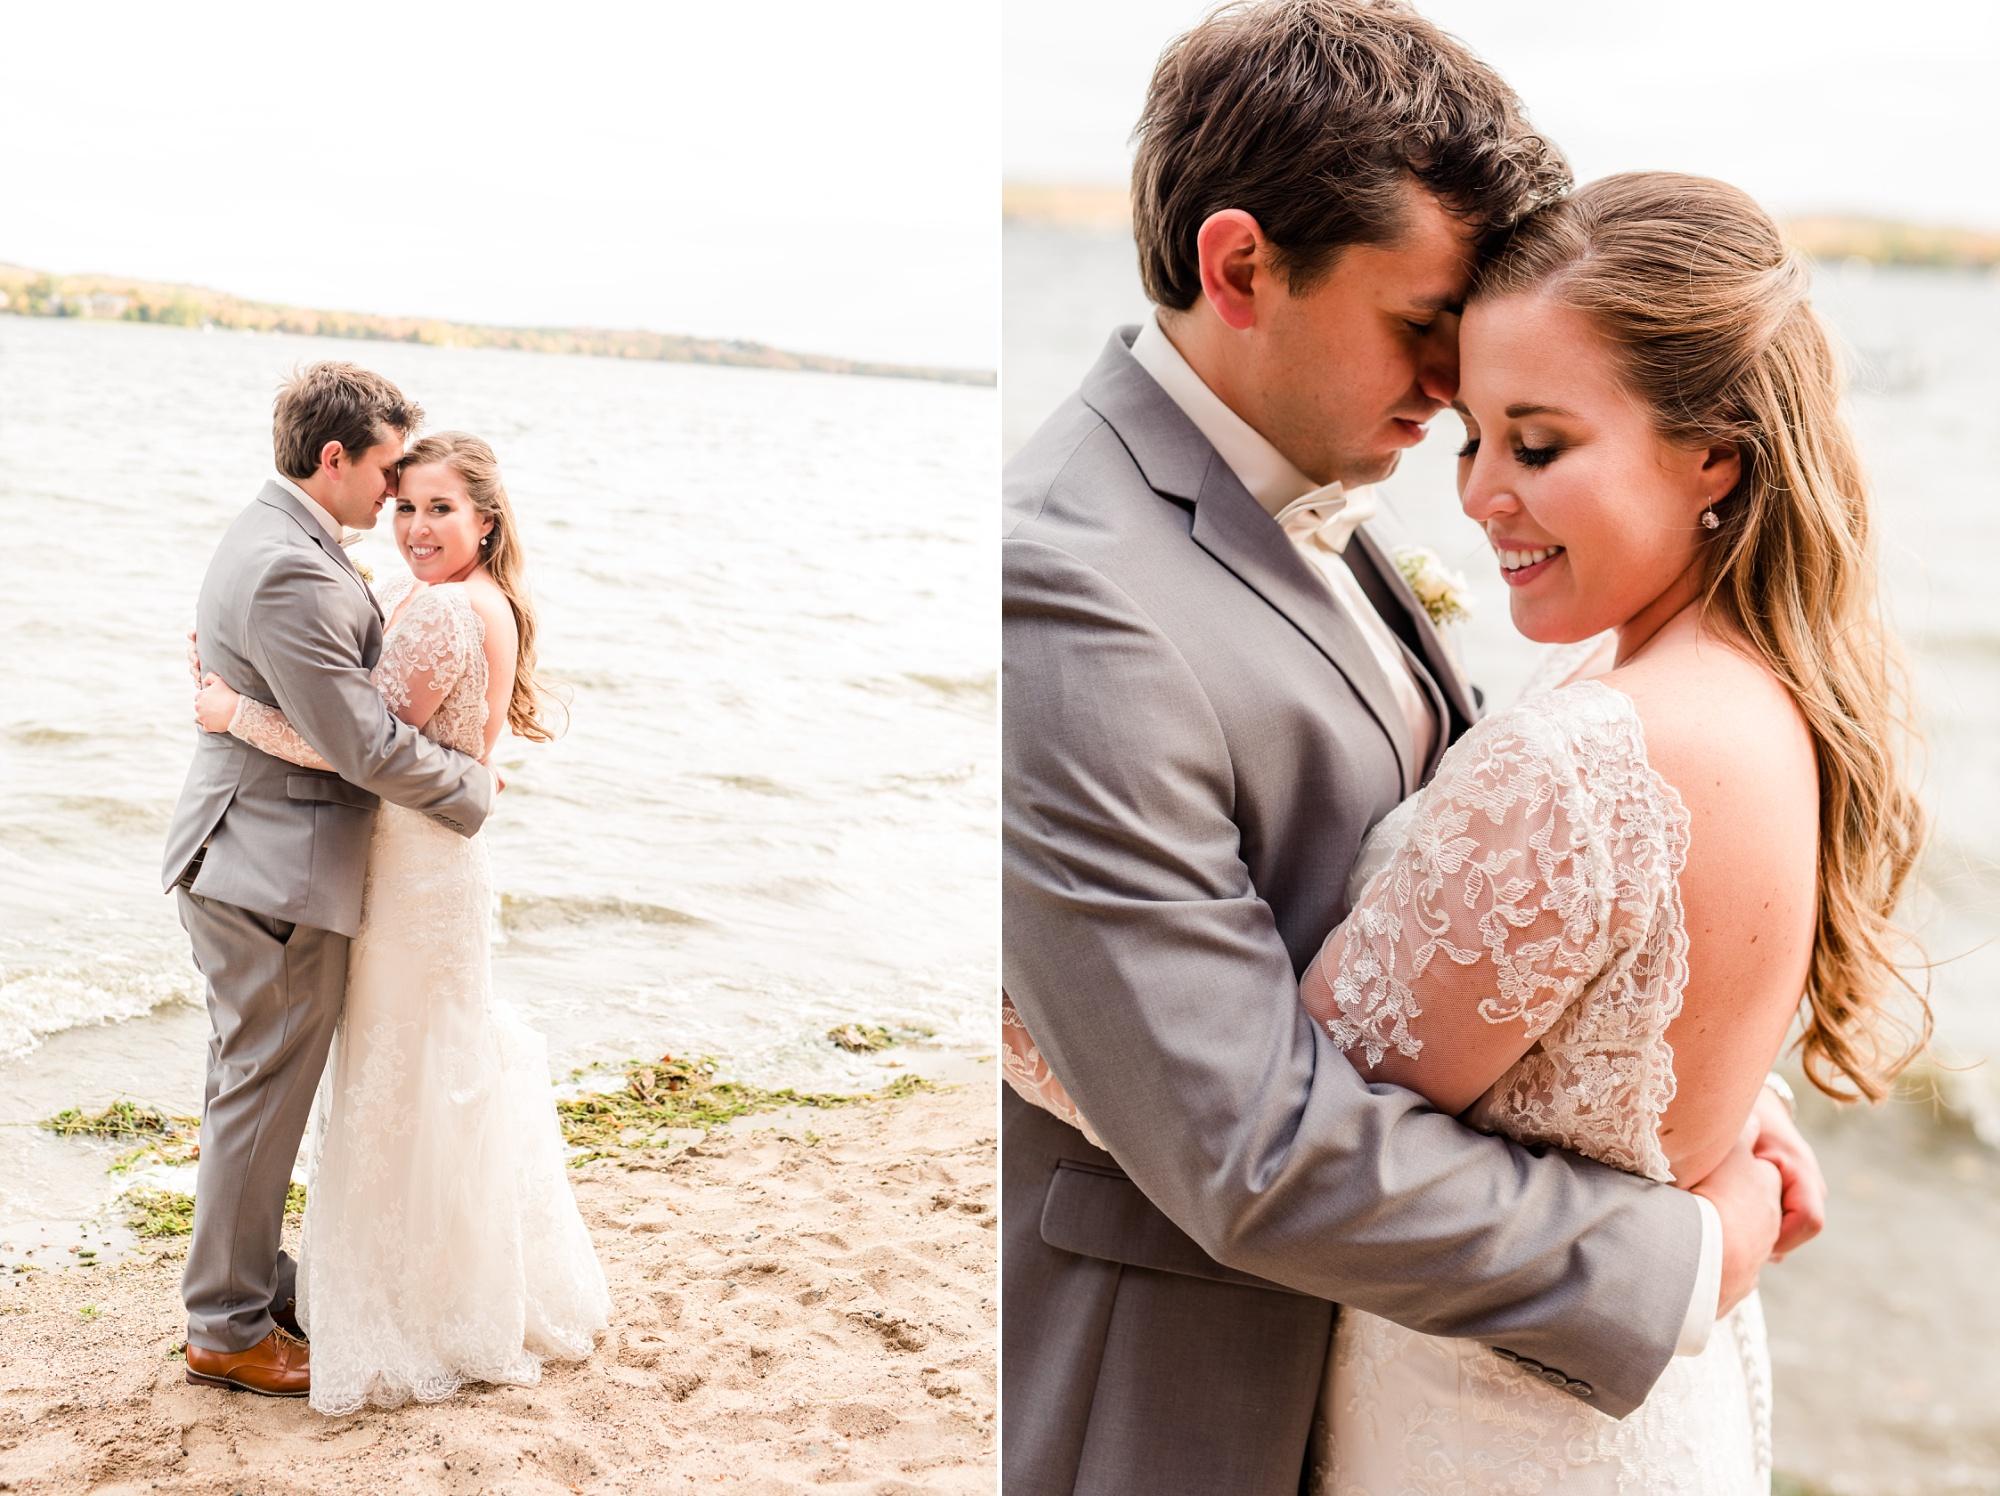 AmberLangerudPhotography_Fair Hills Resort Lakeside Wedding in Minnesota_3474.jpg